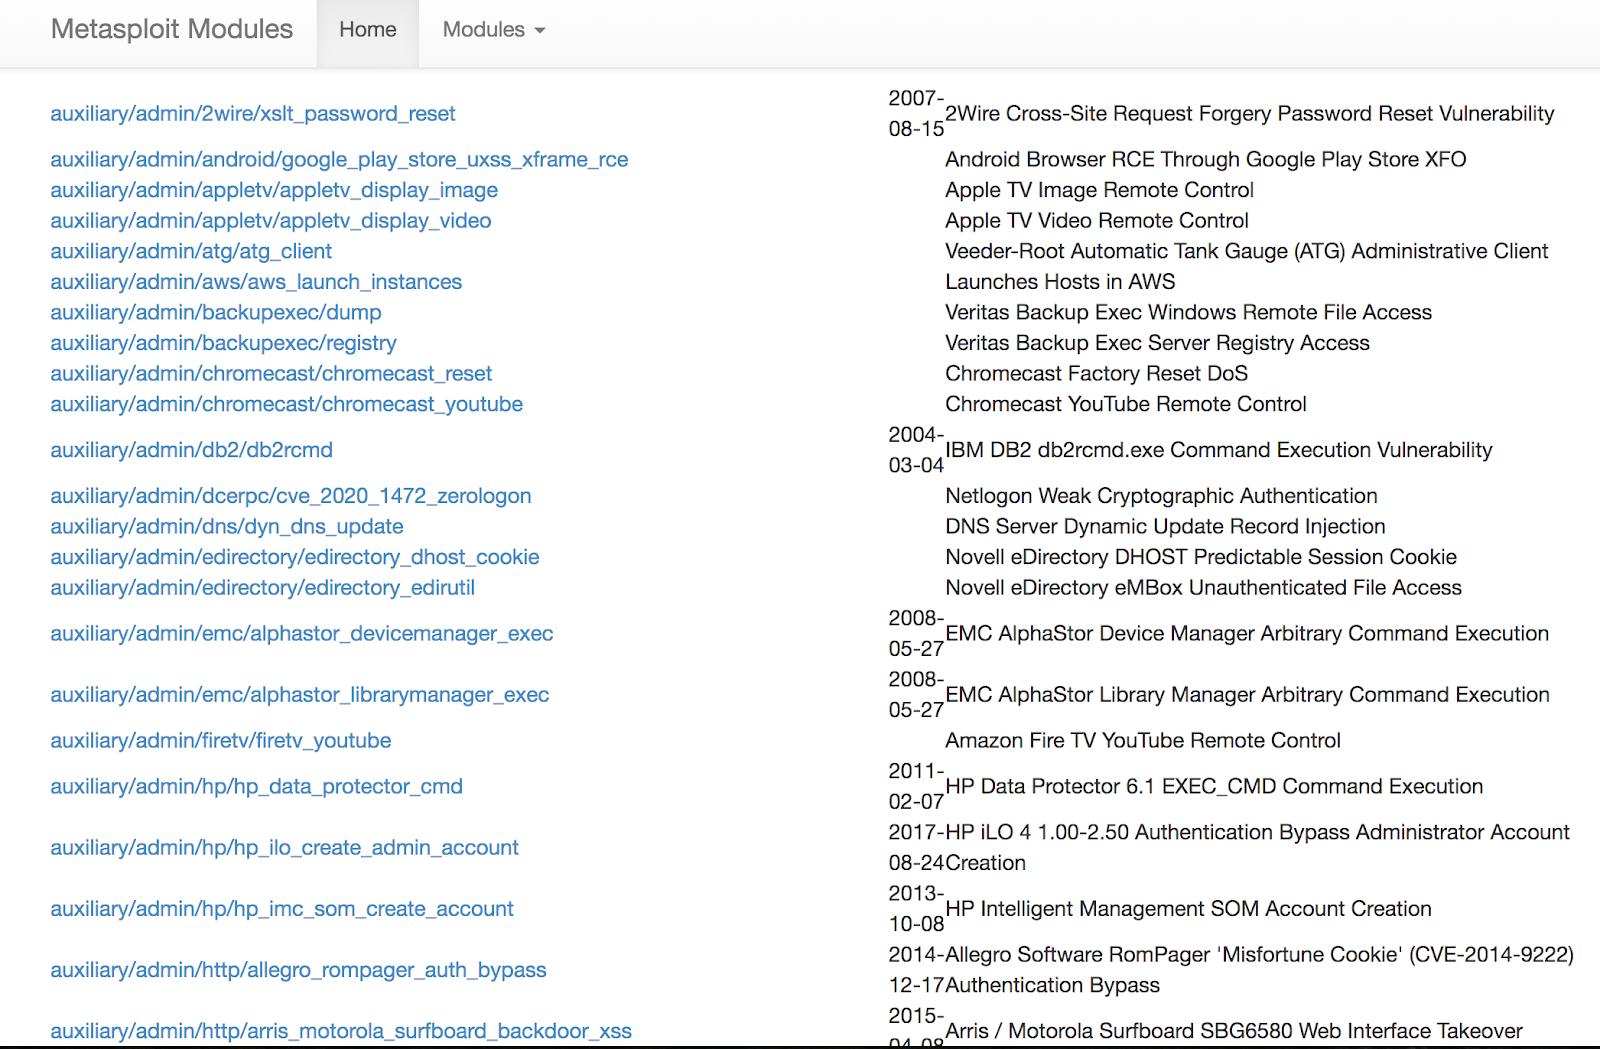 Screenshot of metasploit modules challenge.